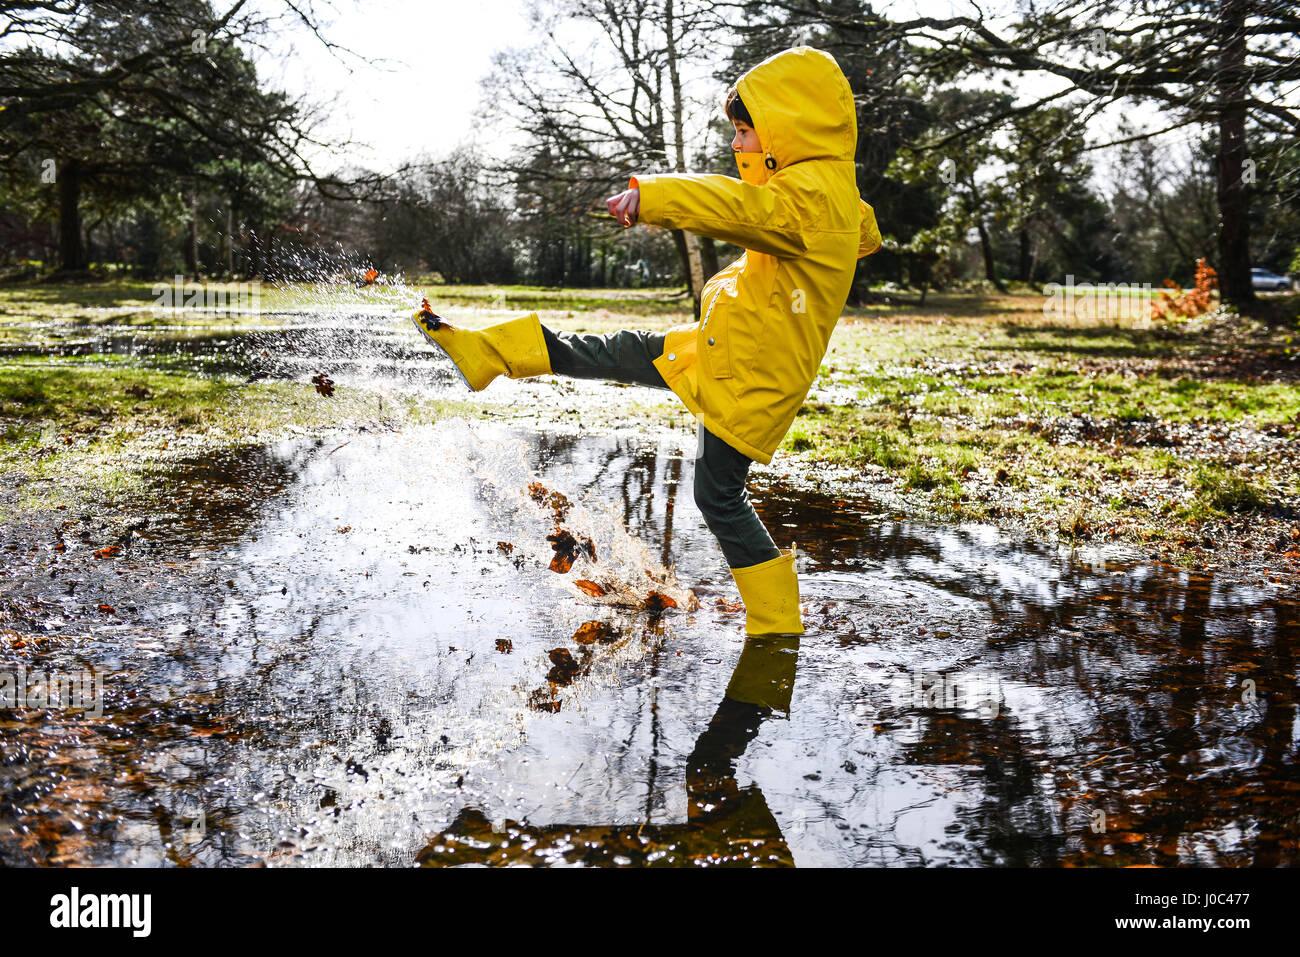 Boy in yellow anorak splashing in park puddle - Stock Image